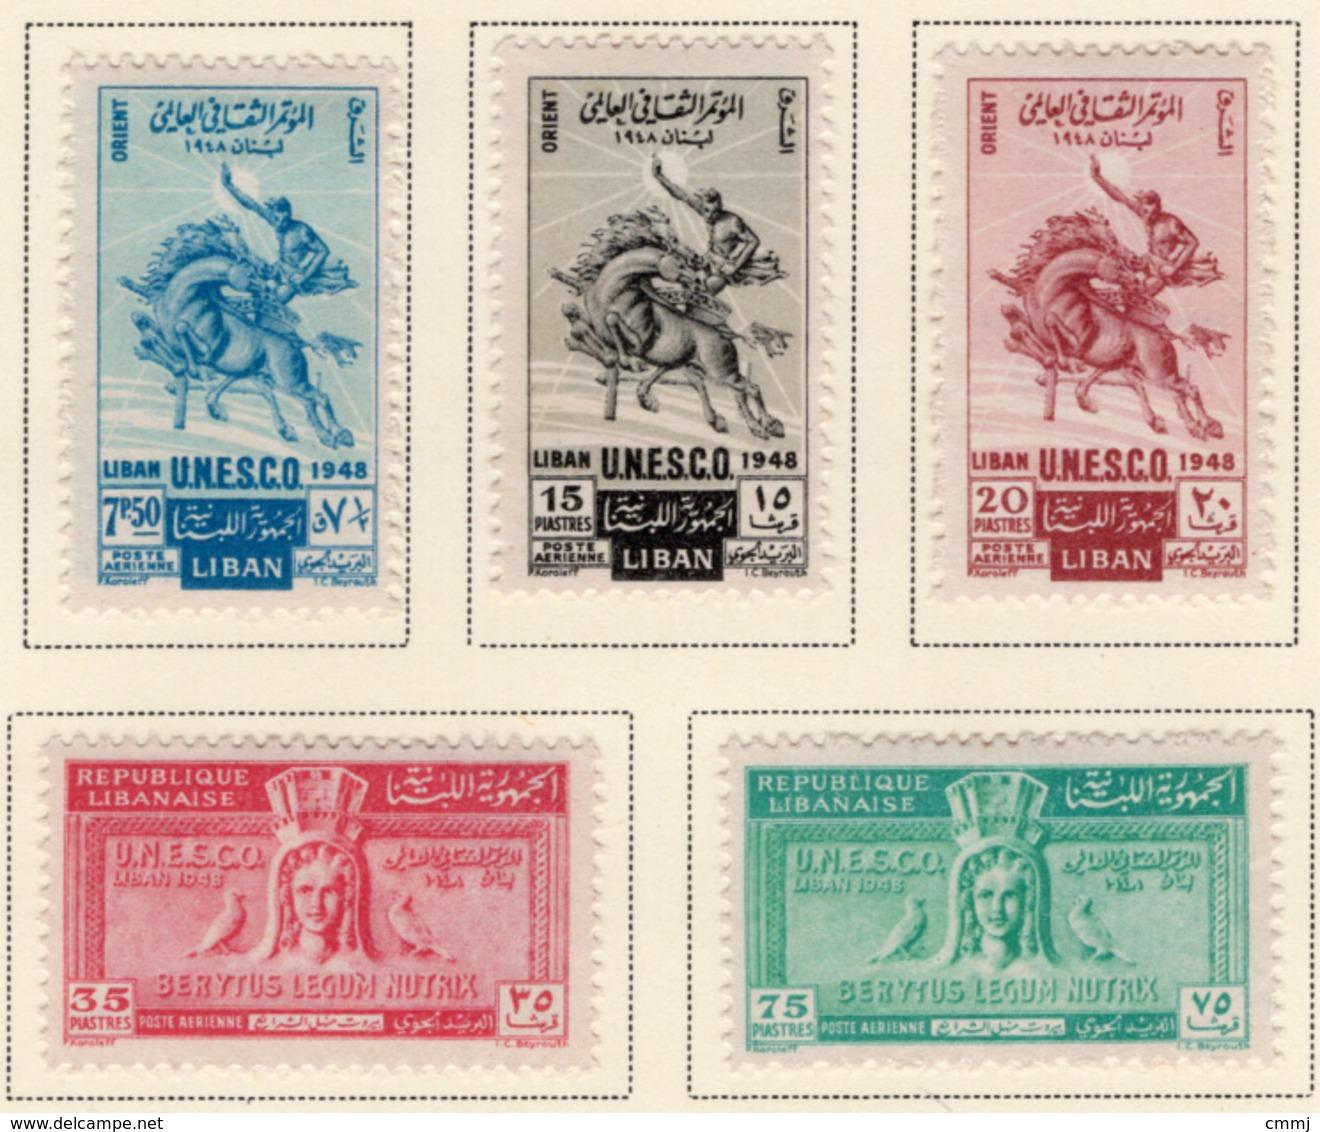 1948 - LIBANO - LEBANON - Mi. Nr.  403/407 - LH - (S03052019.....) - Libano